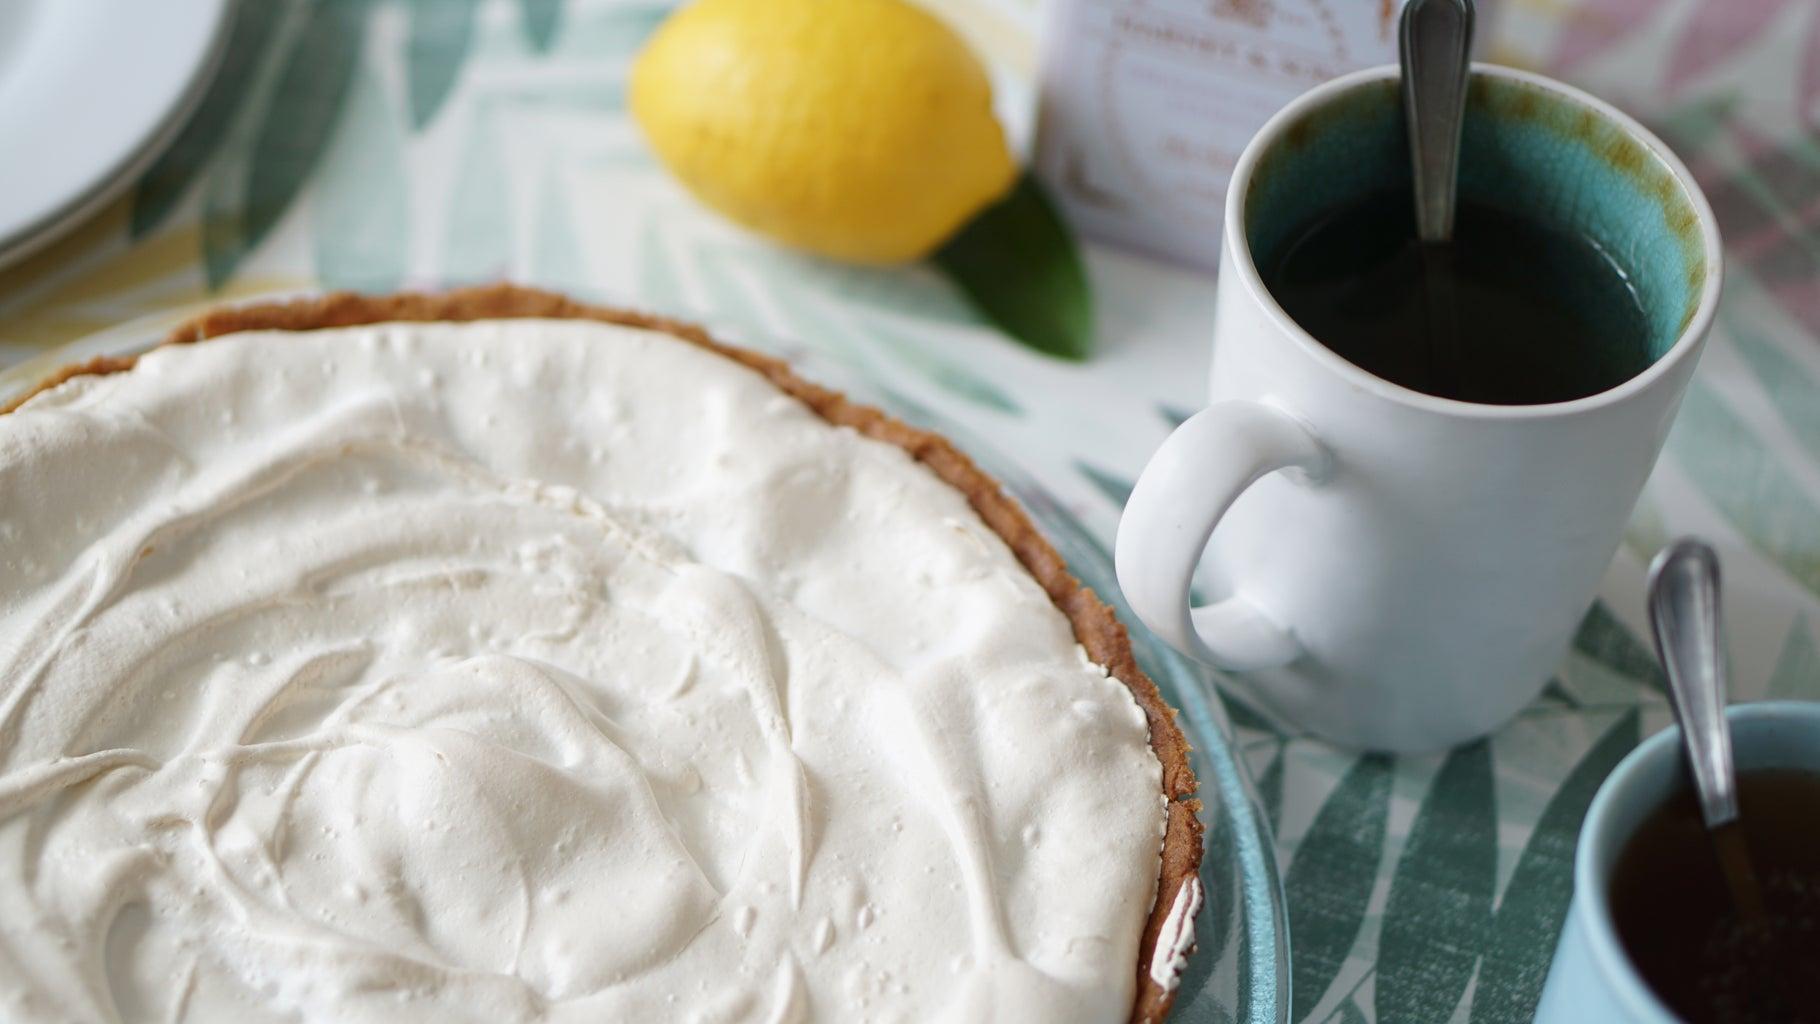 Lemon Meringue Pie (tarte Au Citron Meringuée)